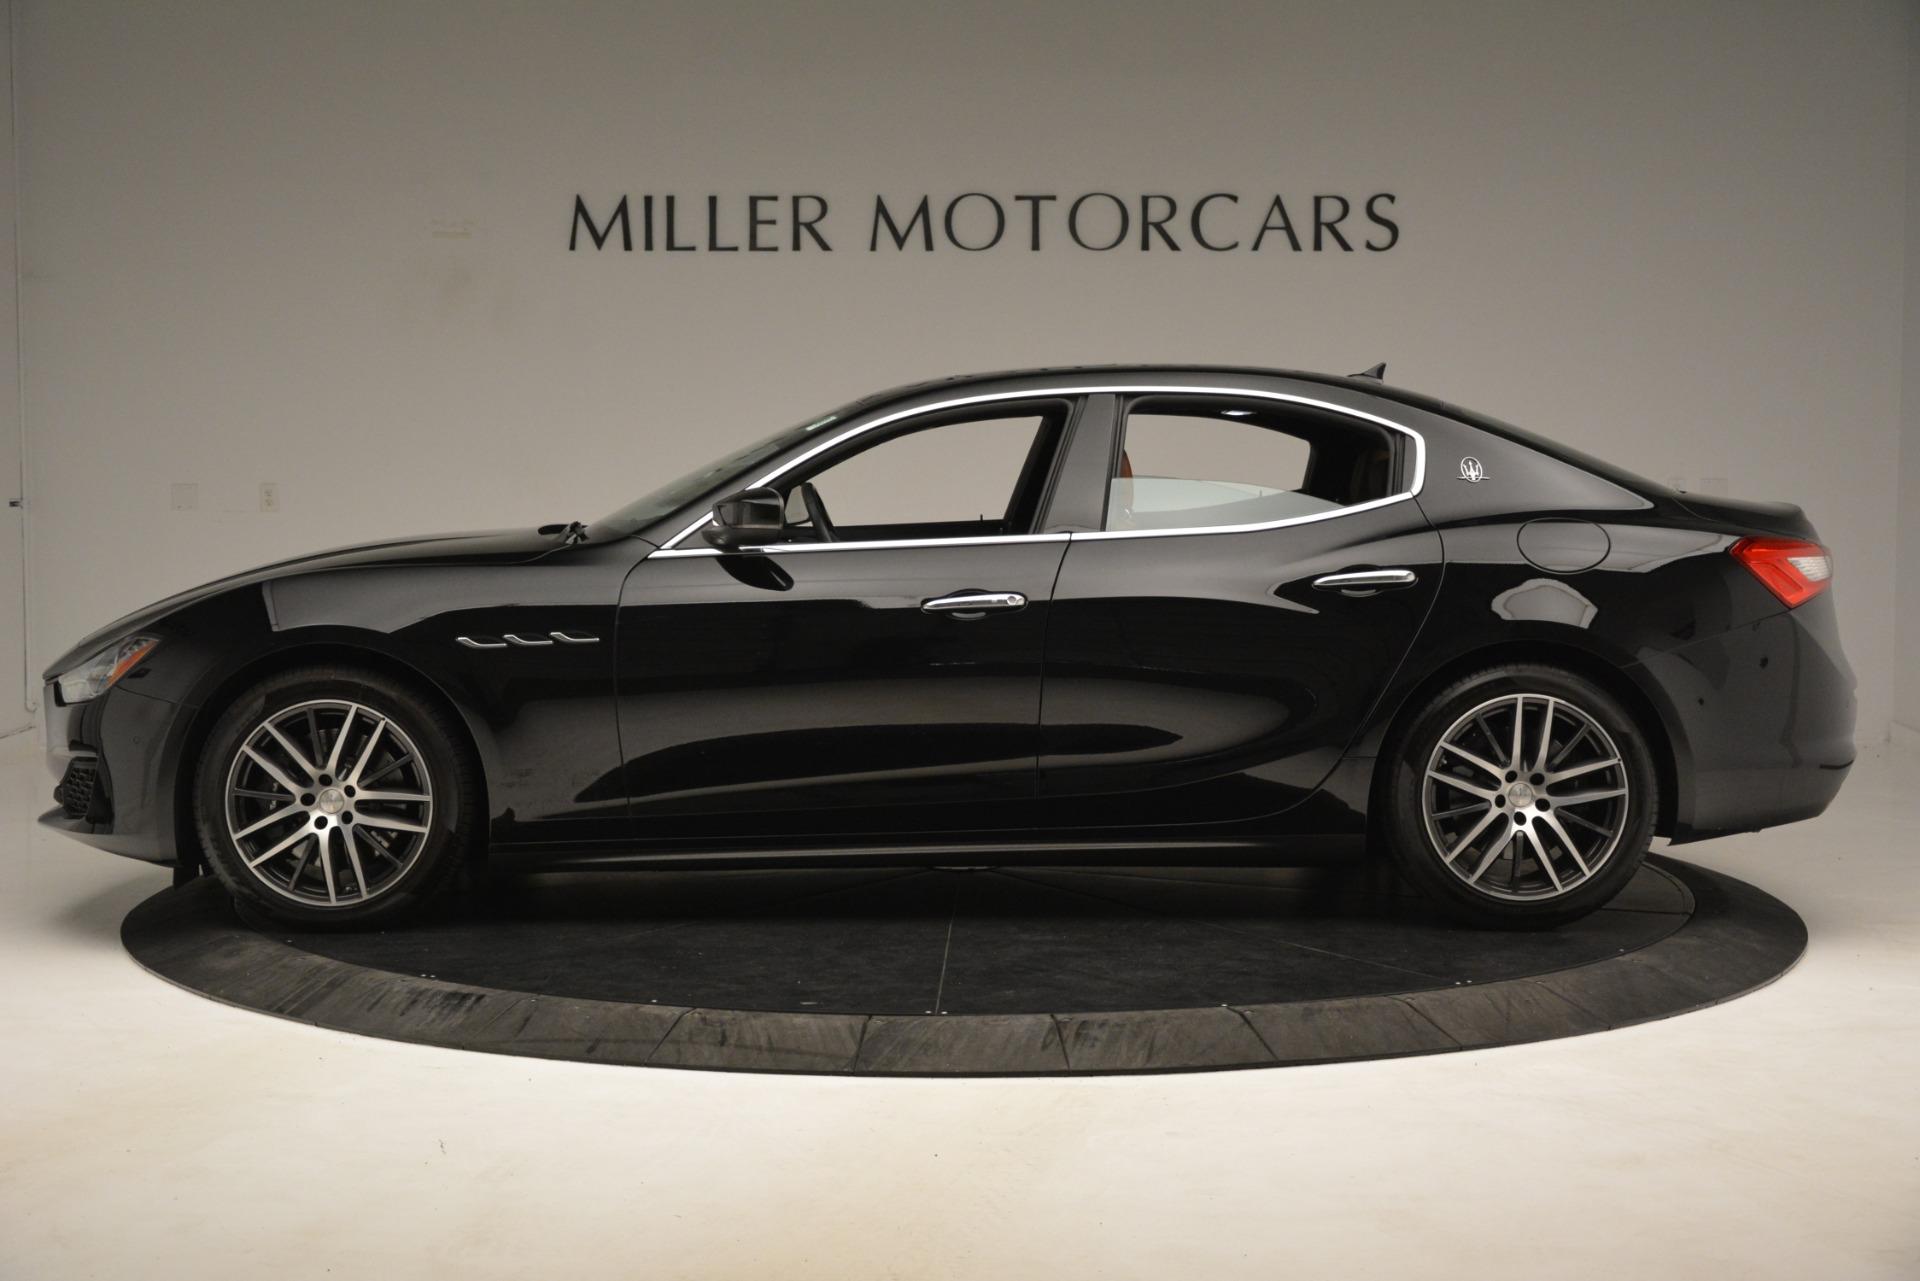 New 2019 Maserati Ghibli S Q4 For Sale In Westport, CT 2792_p3